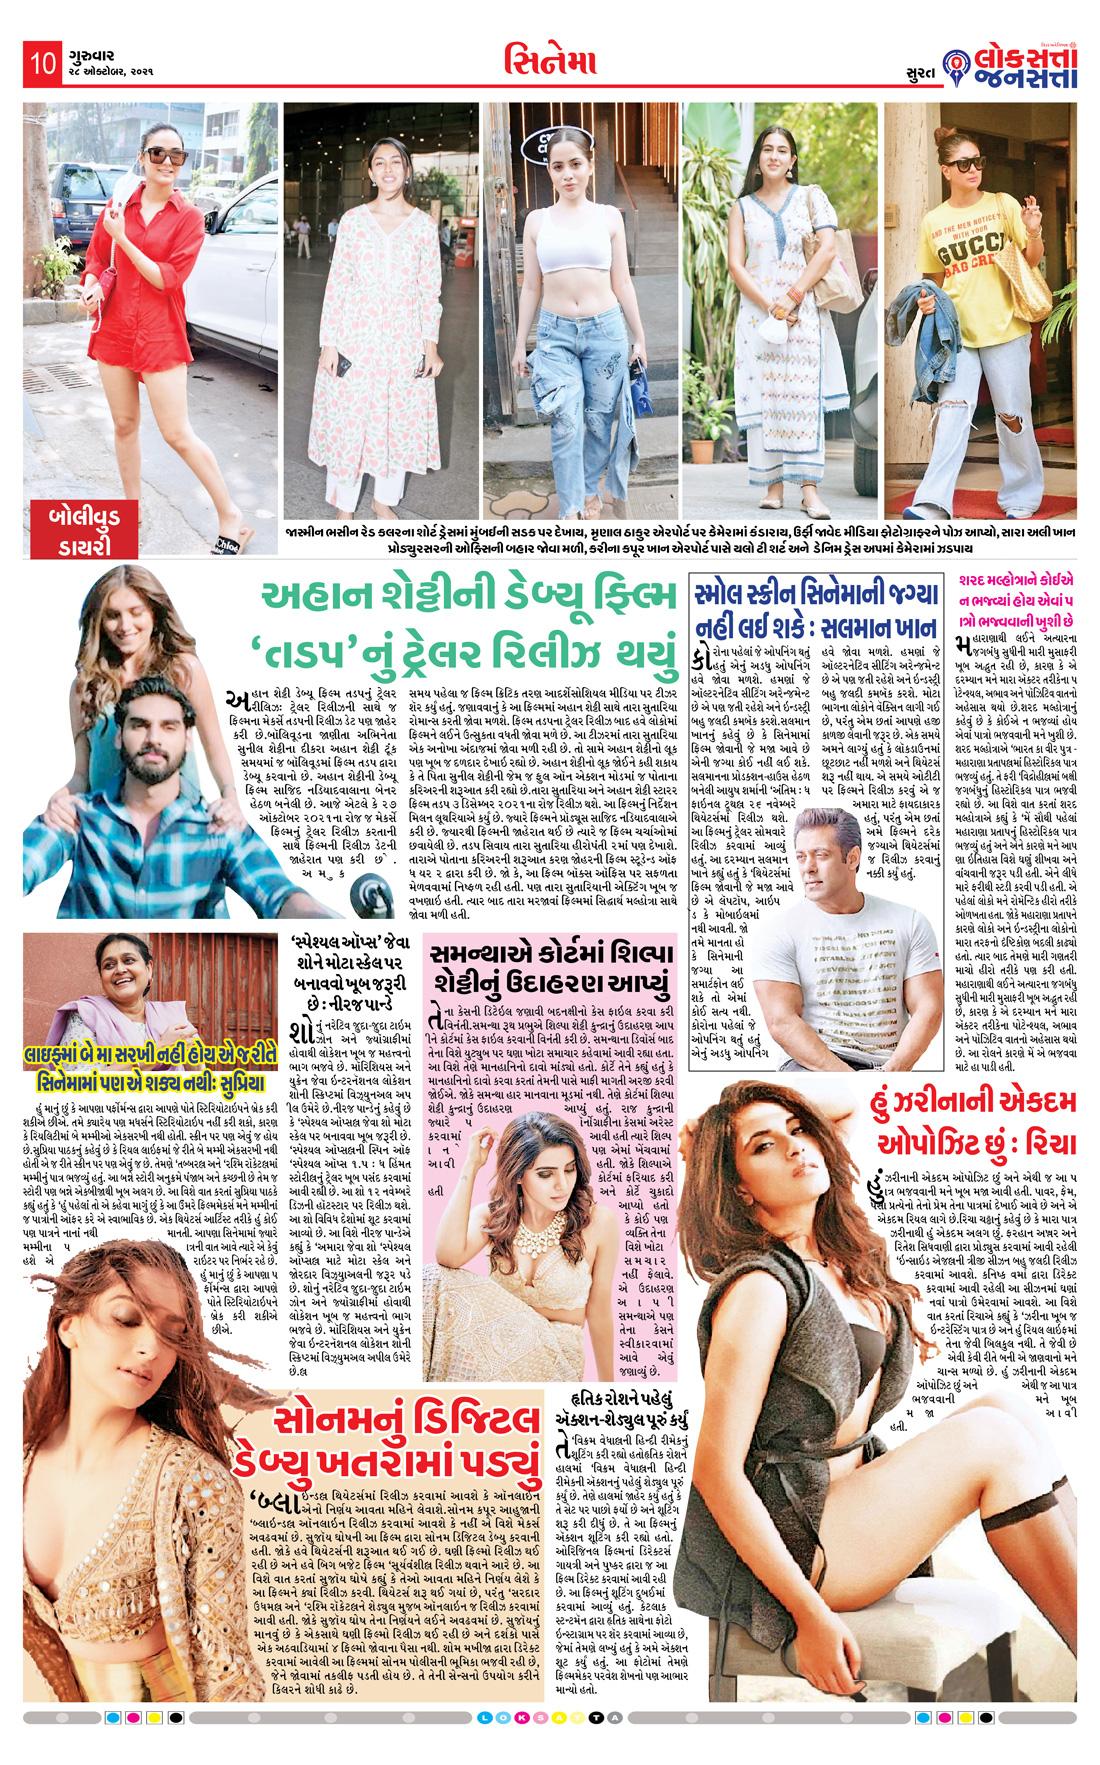 Loksatta Jansatta News Papaer E-paper dated 2021-10-28   Page 10